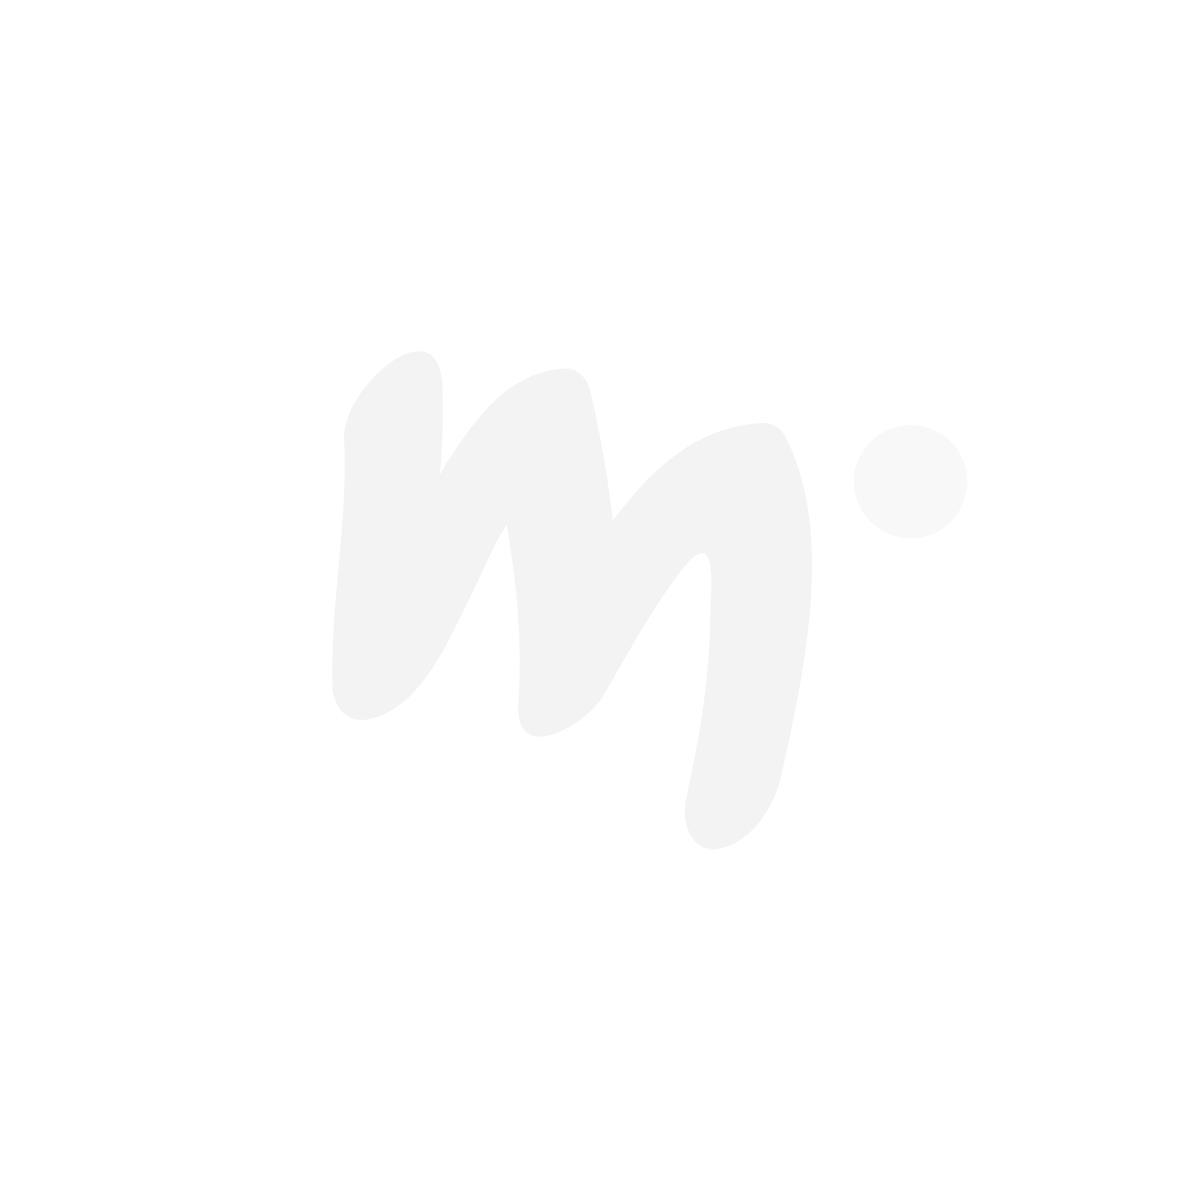 Moomin Figures Minispatula